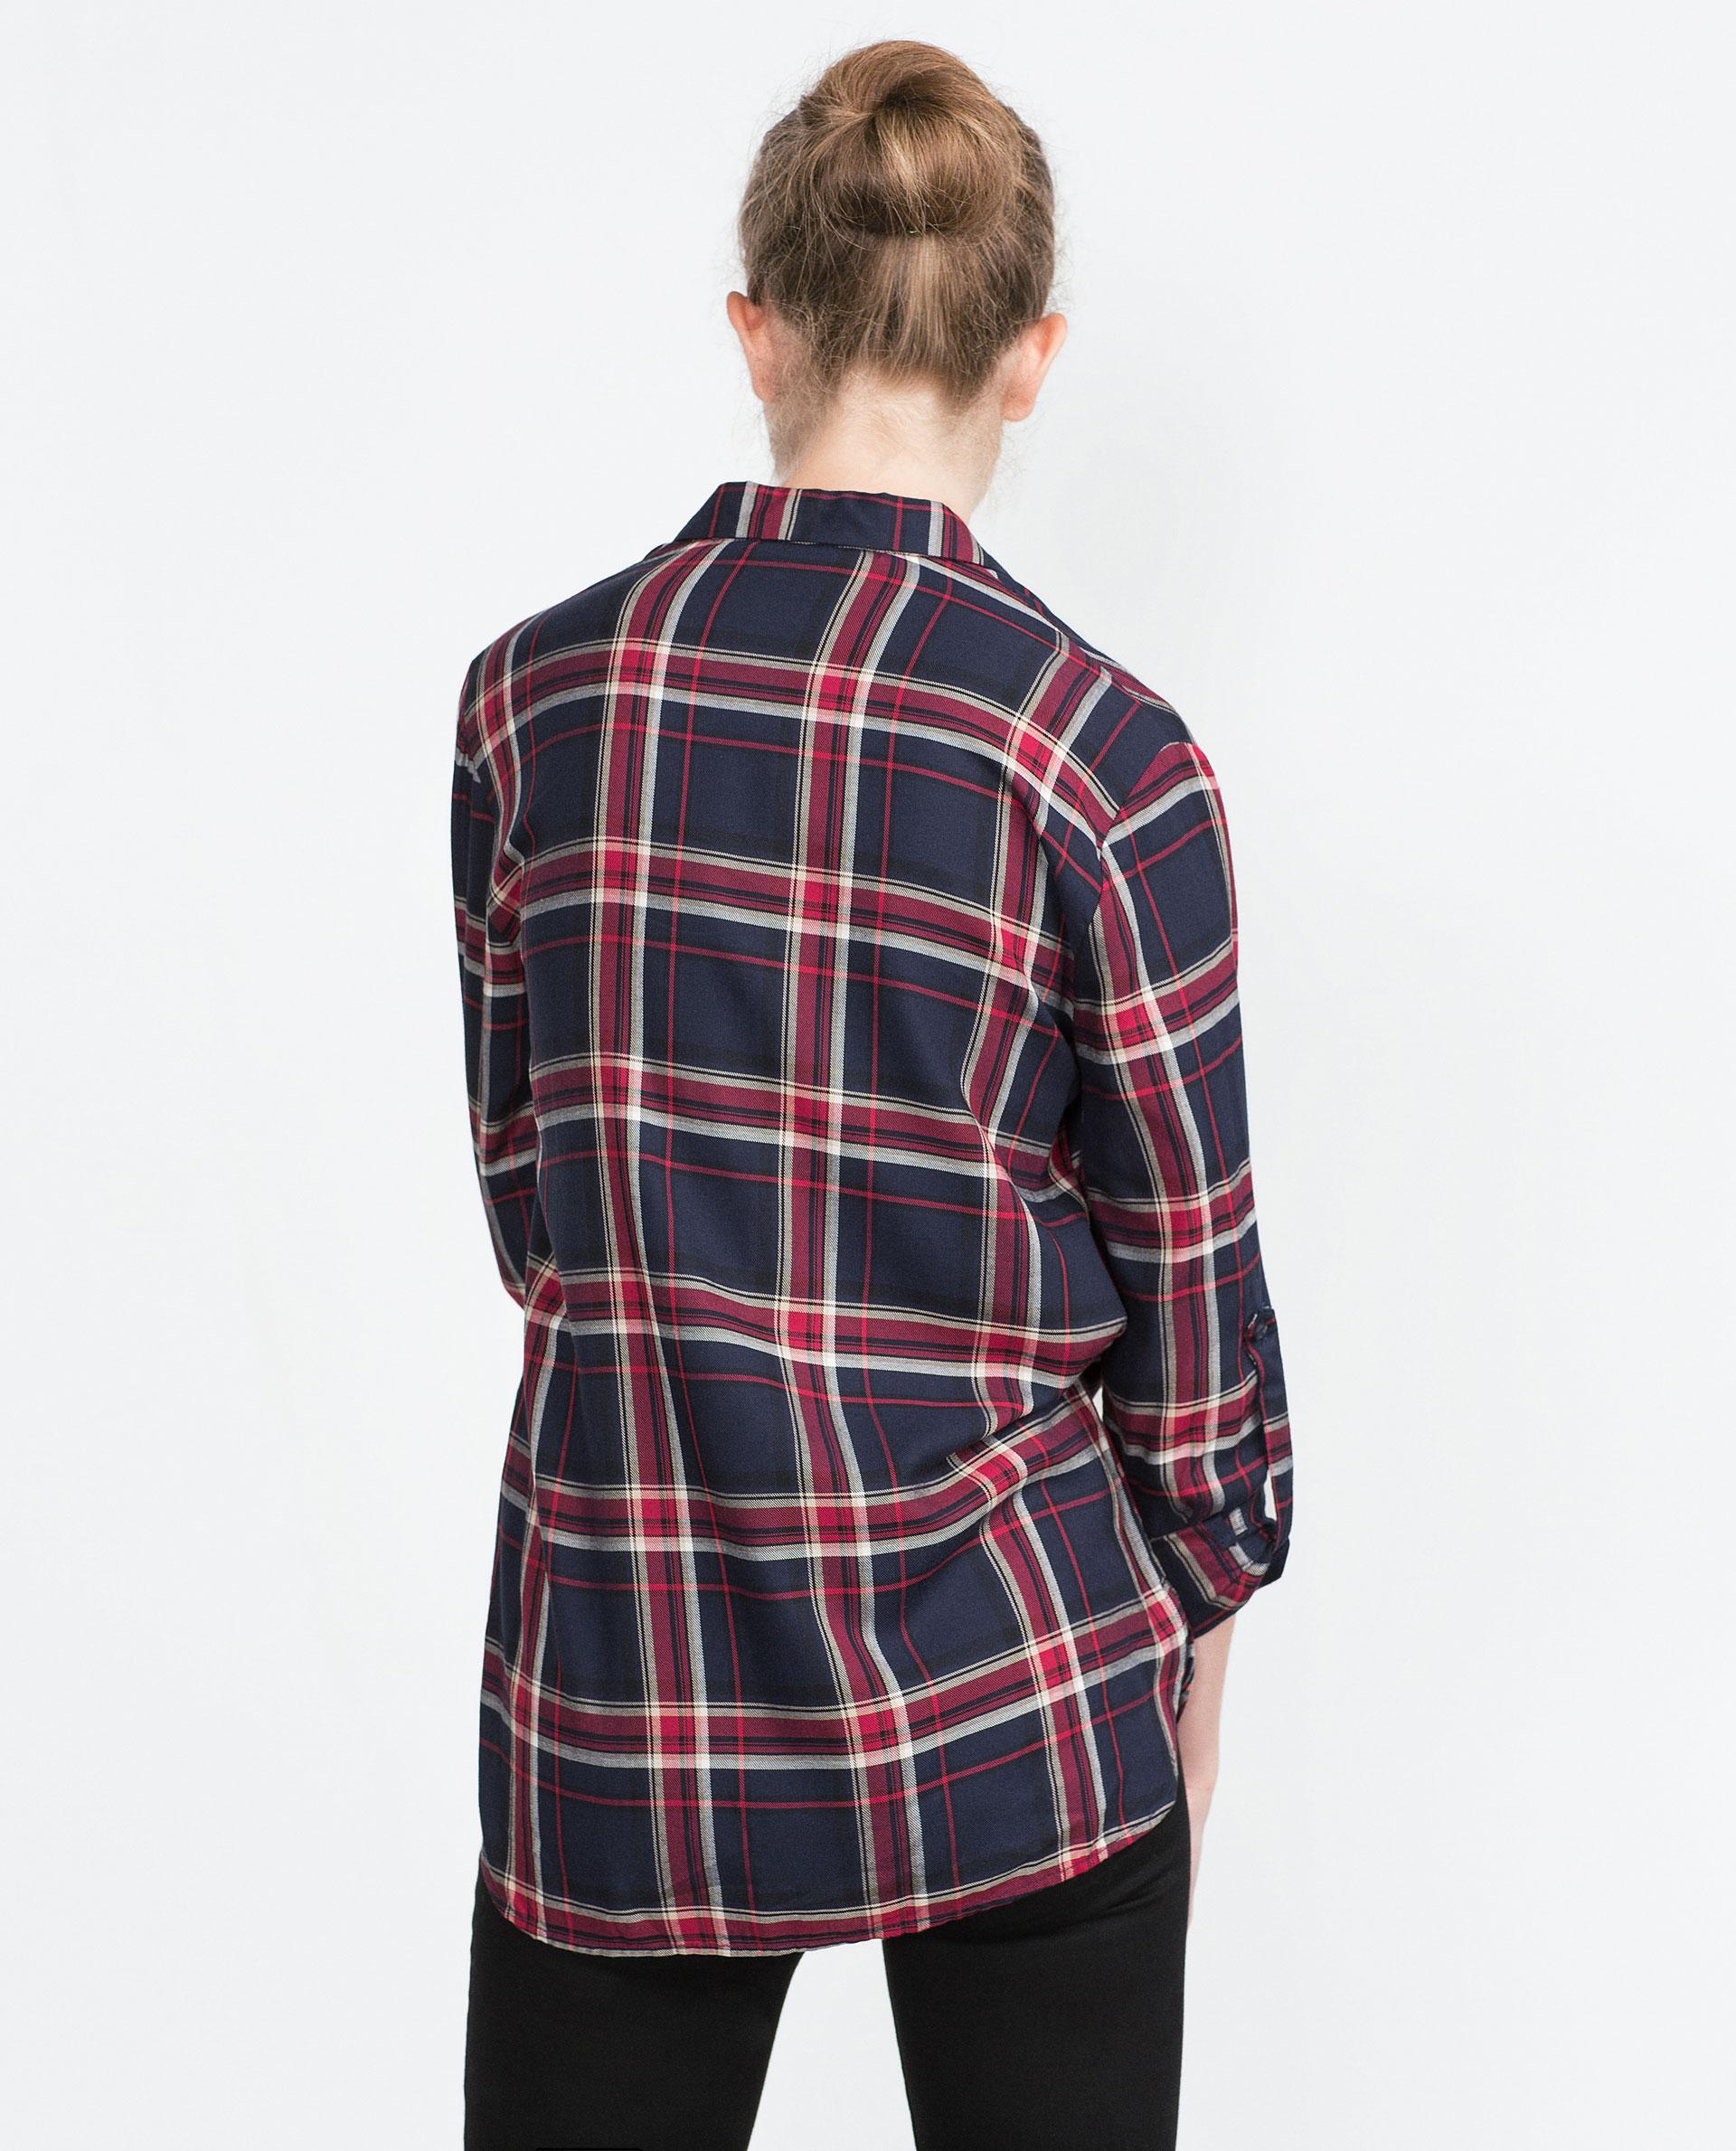 Camisa MujerZara Camisas Camisa España Cuadros n0w8OkP